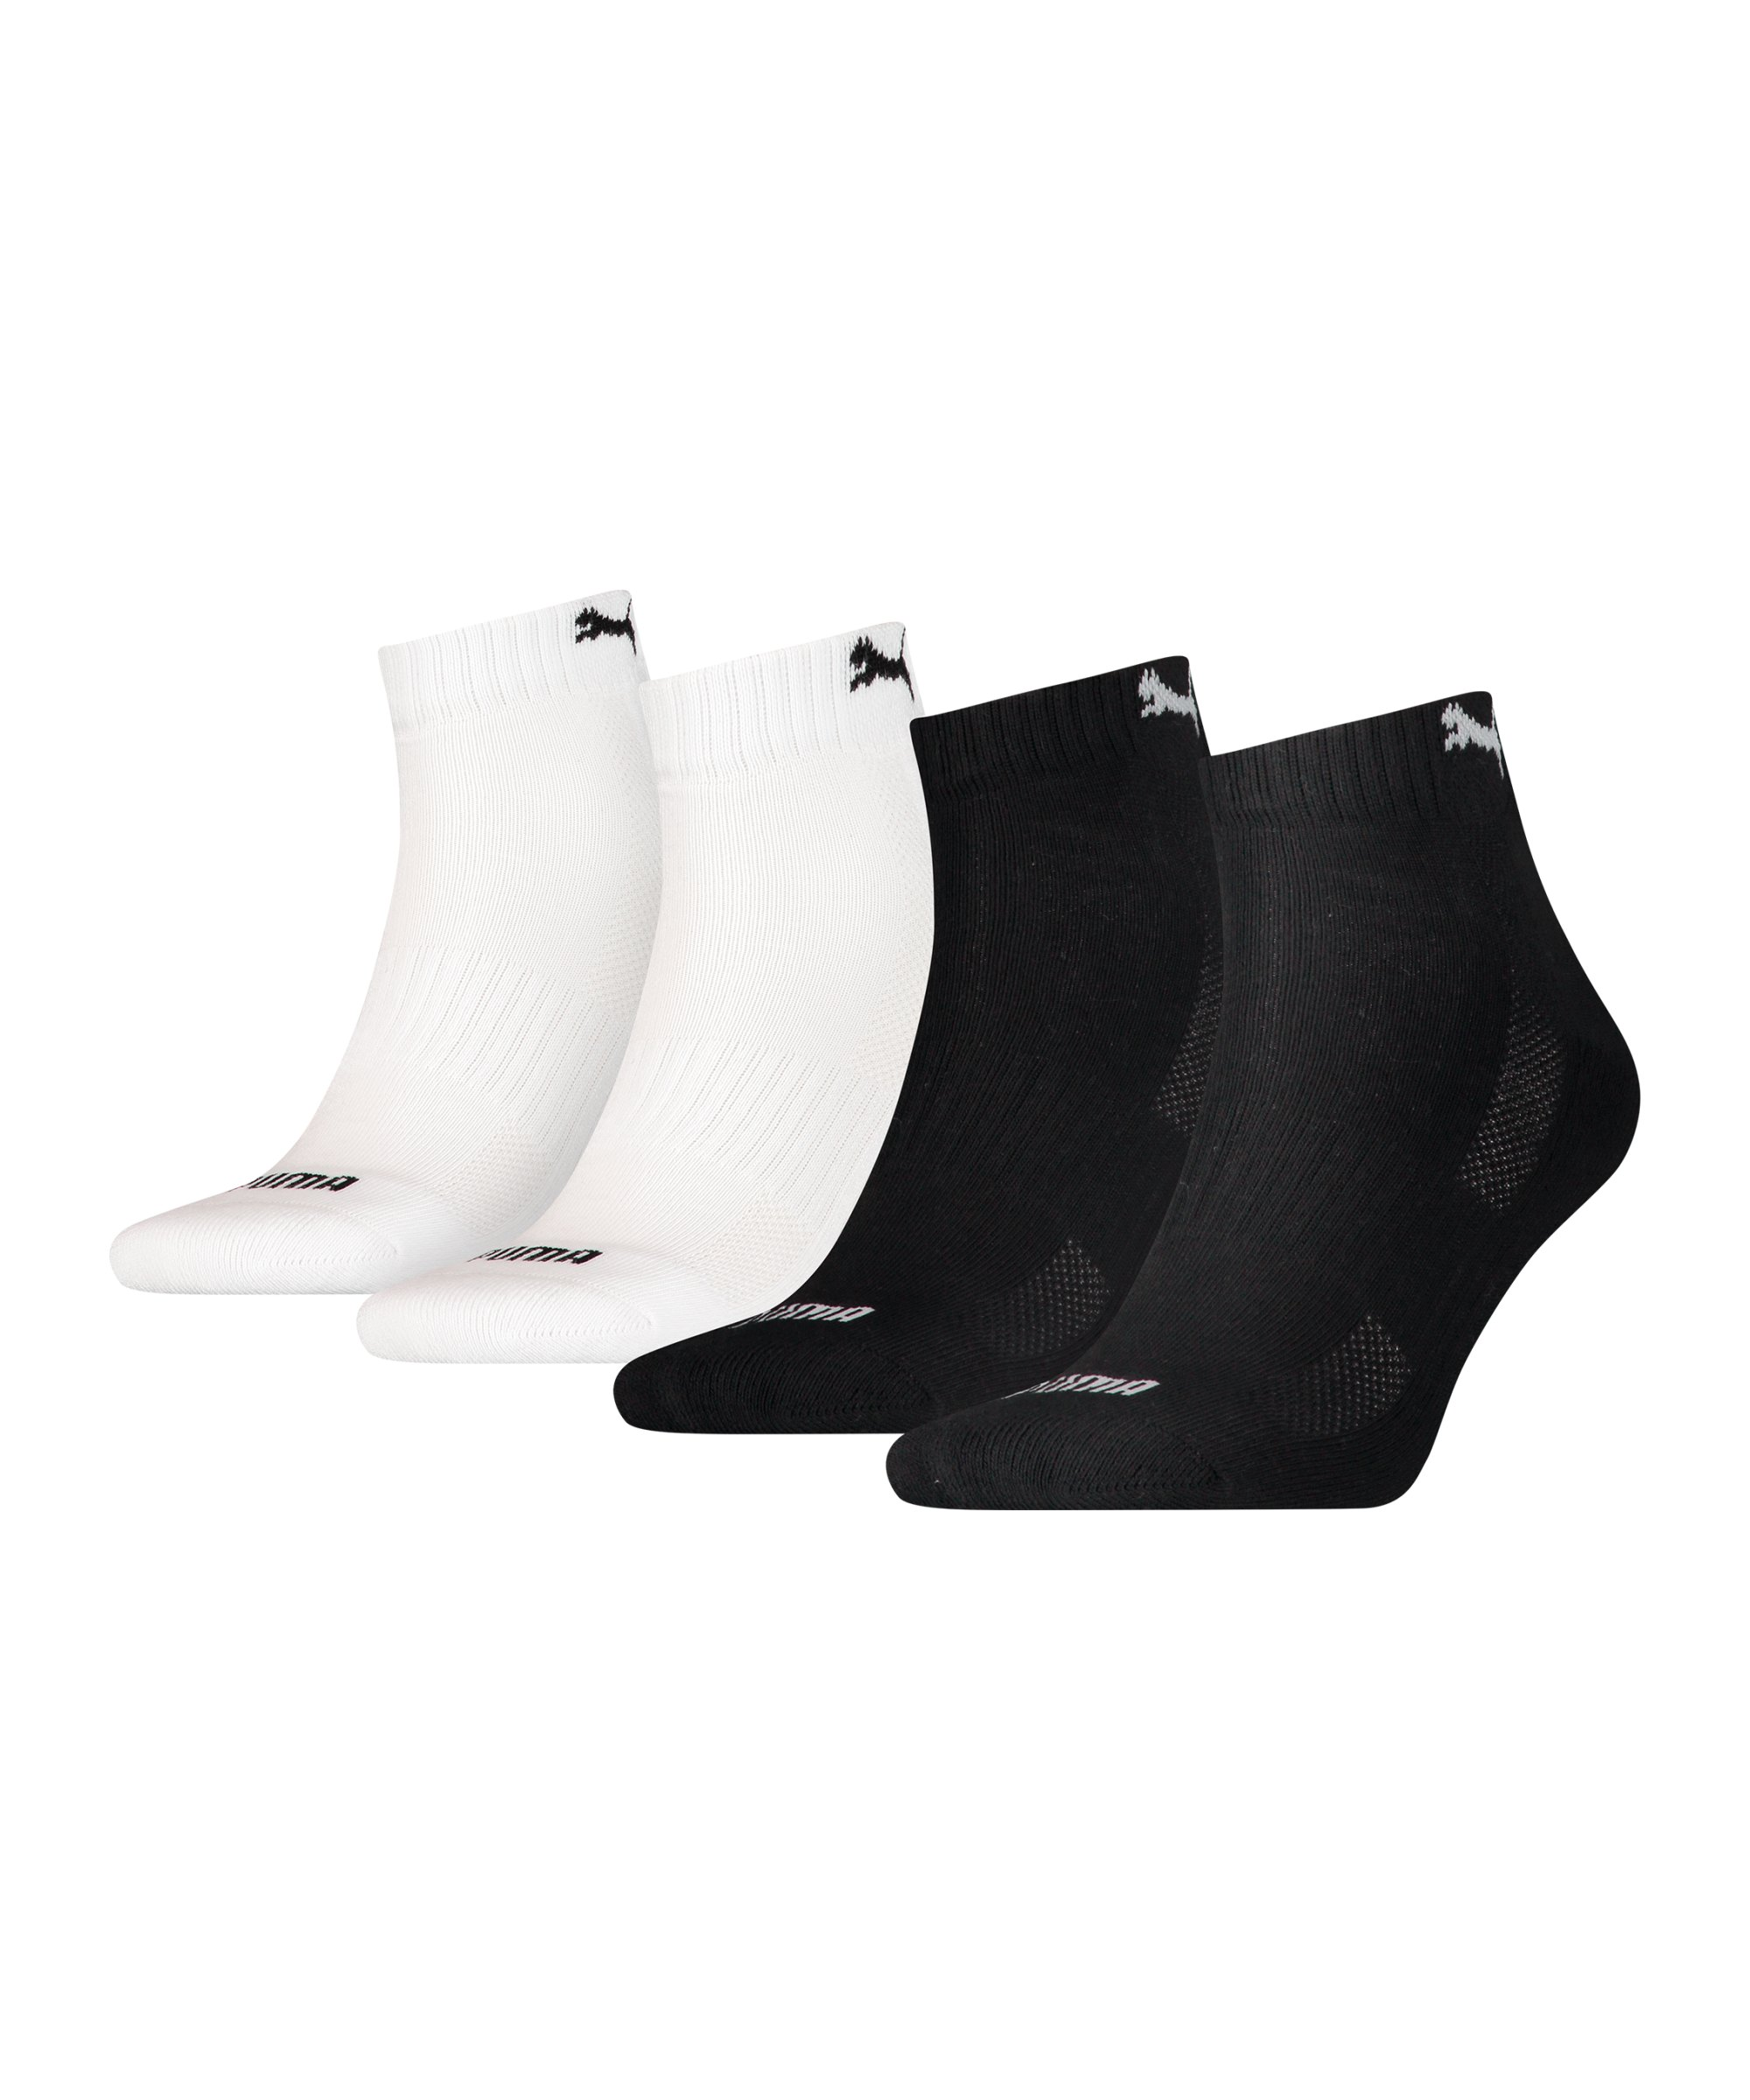 PUMA Quarter Socken 4er Pack Schwarz Weiss F001 - schwarz